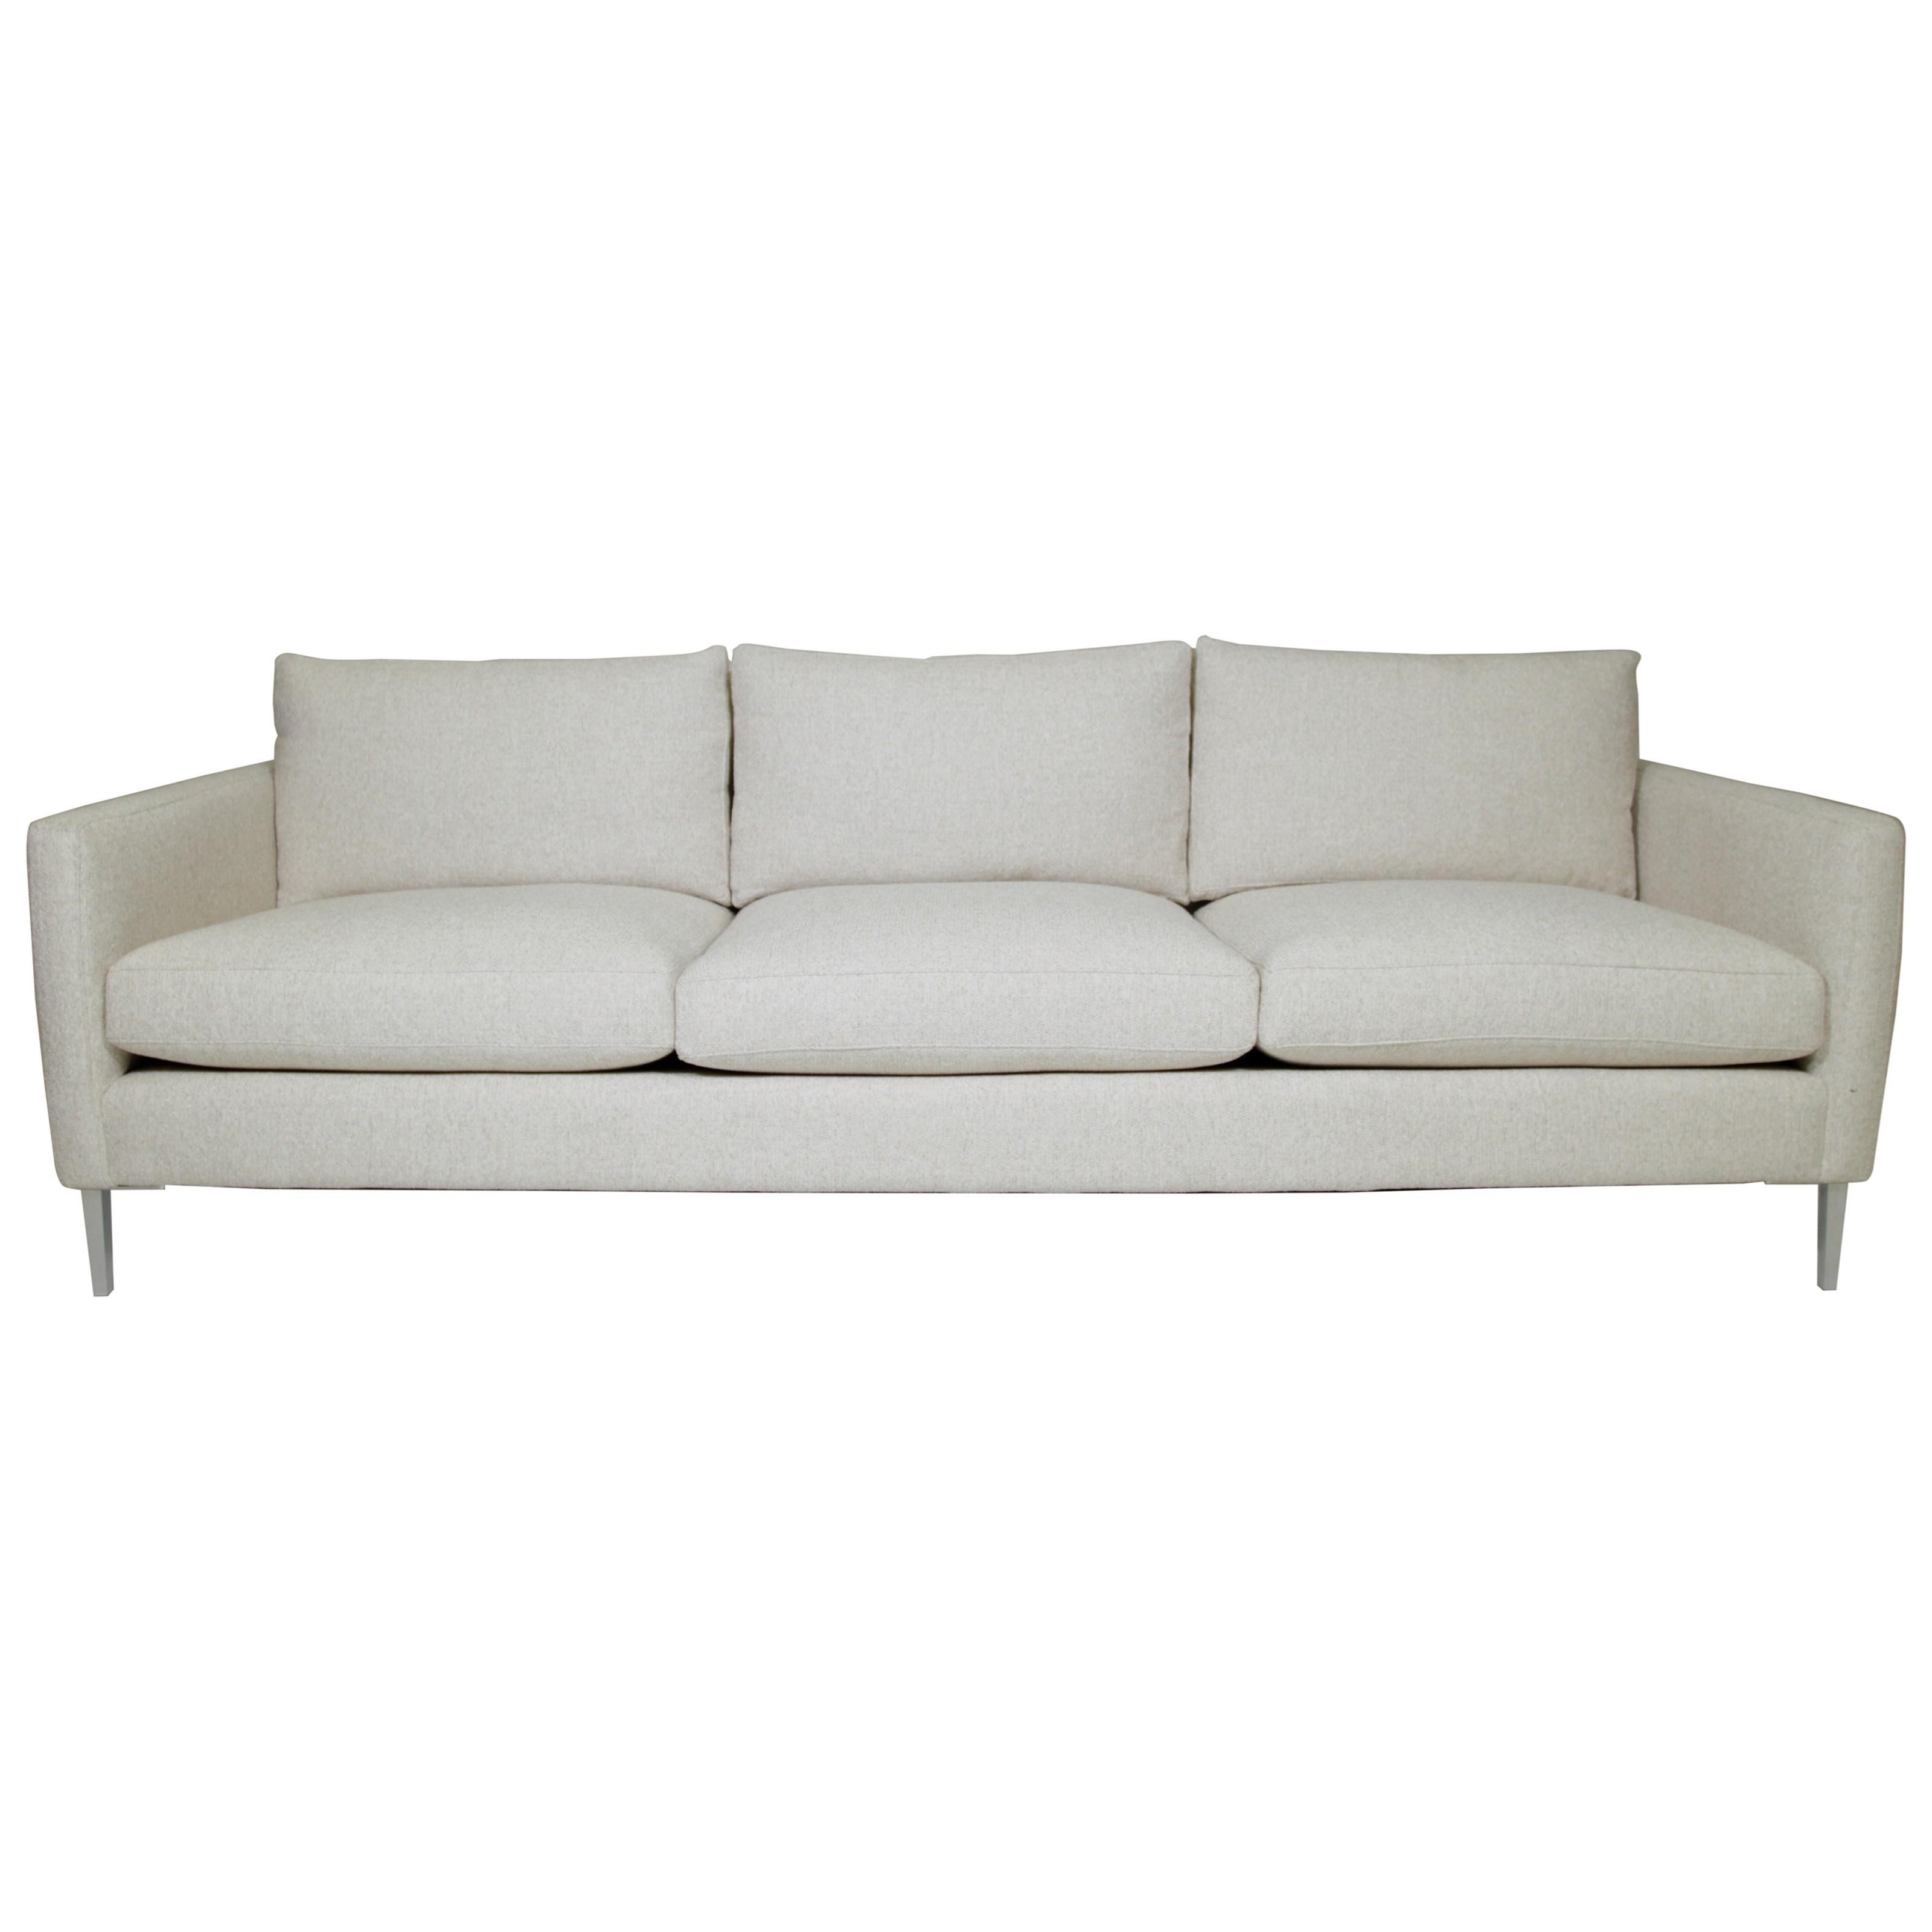 McCreary Modern Audrey II Sofa - Item Number: A371-SAB Taft Pearl